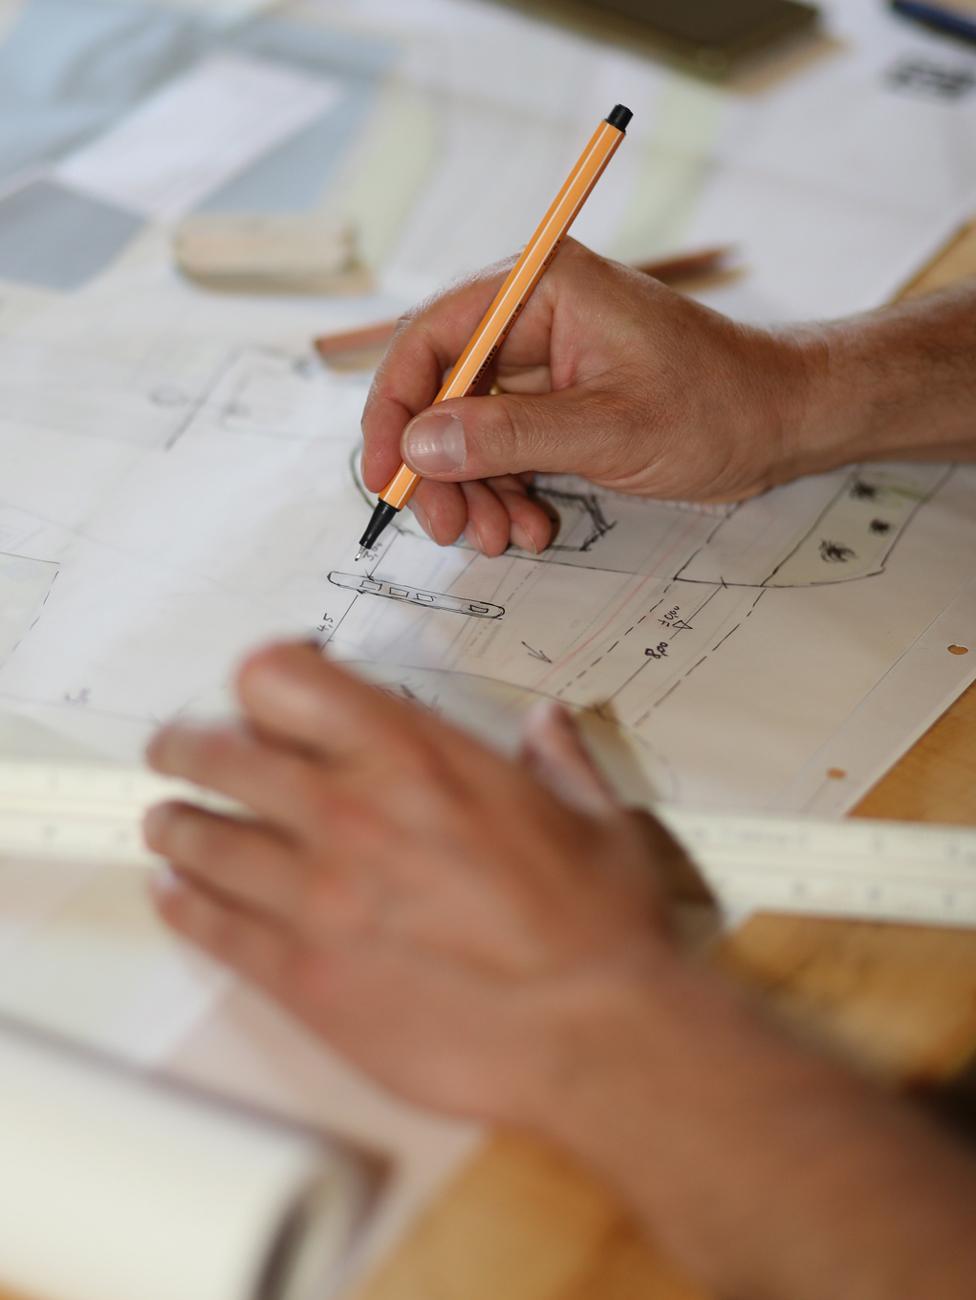 Objektplanung im Planungsbüro | Handskizze